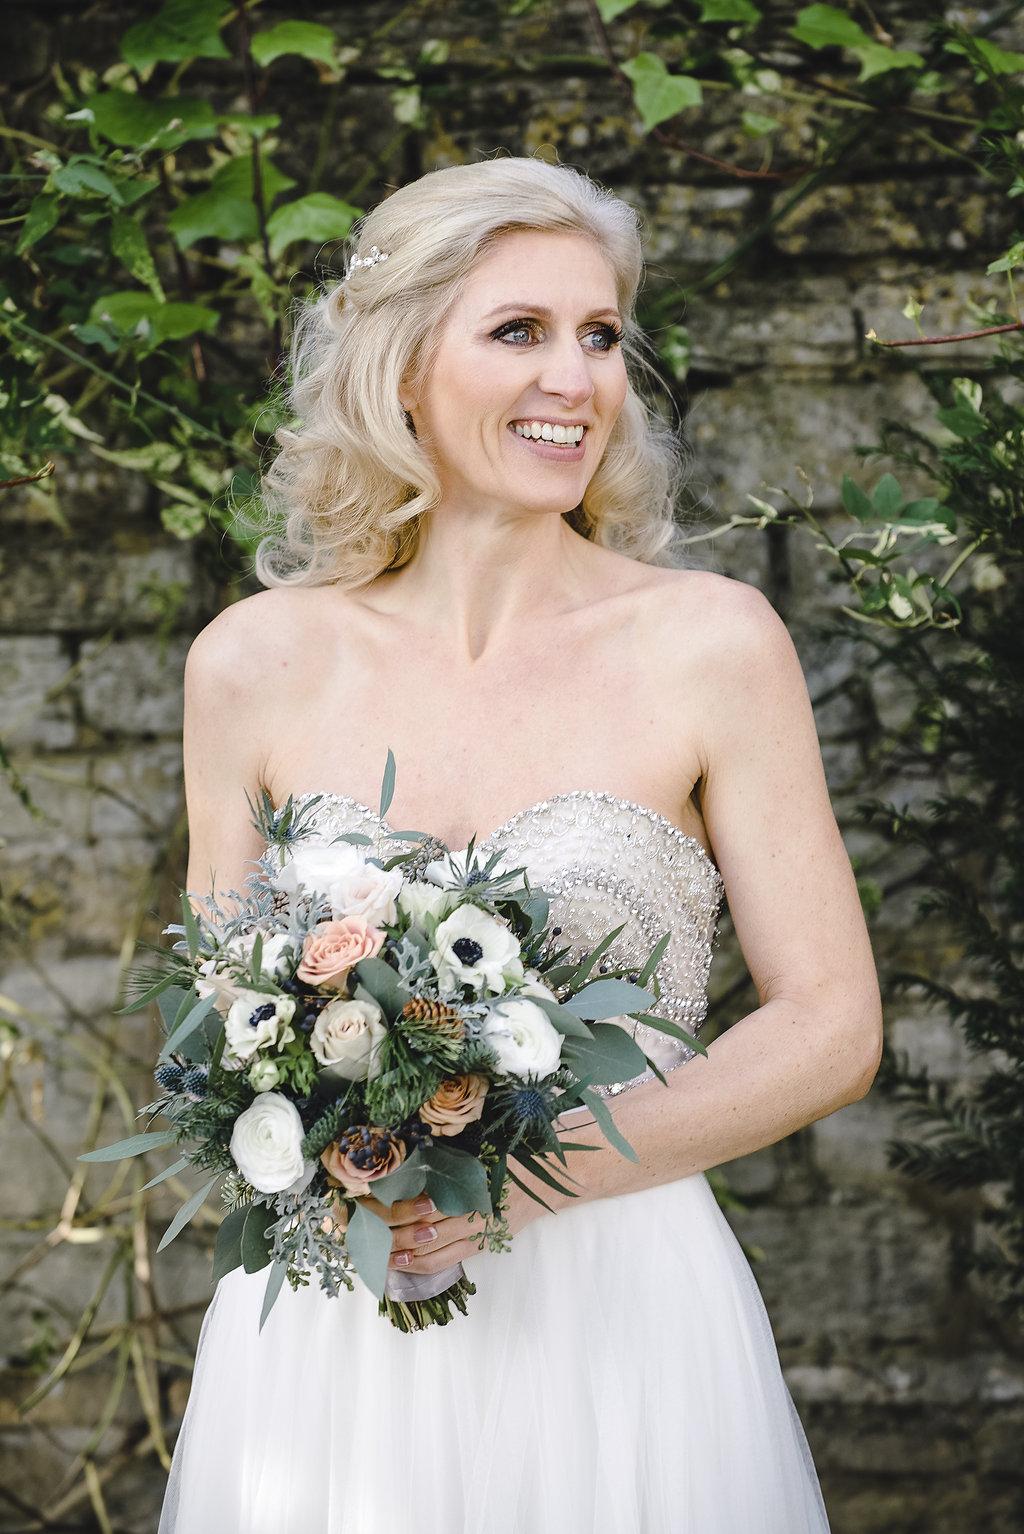 Wedding Makeup Last All Day : Barnsley House Makeup Artist - WeddingsMakeup by Jodie